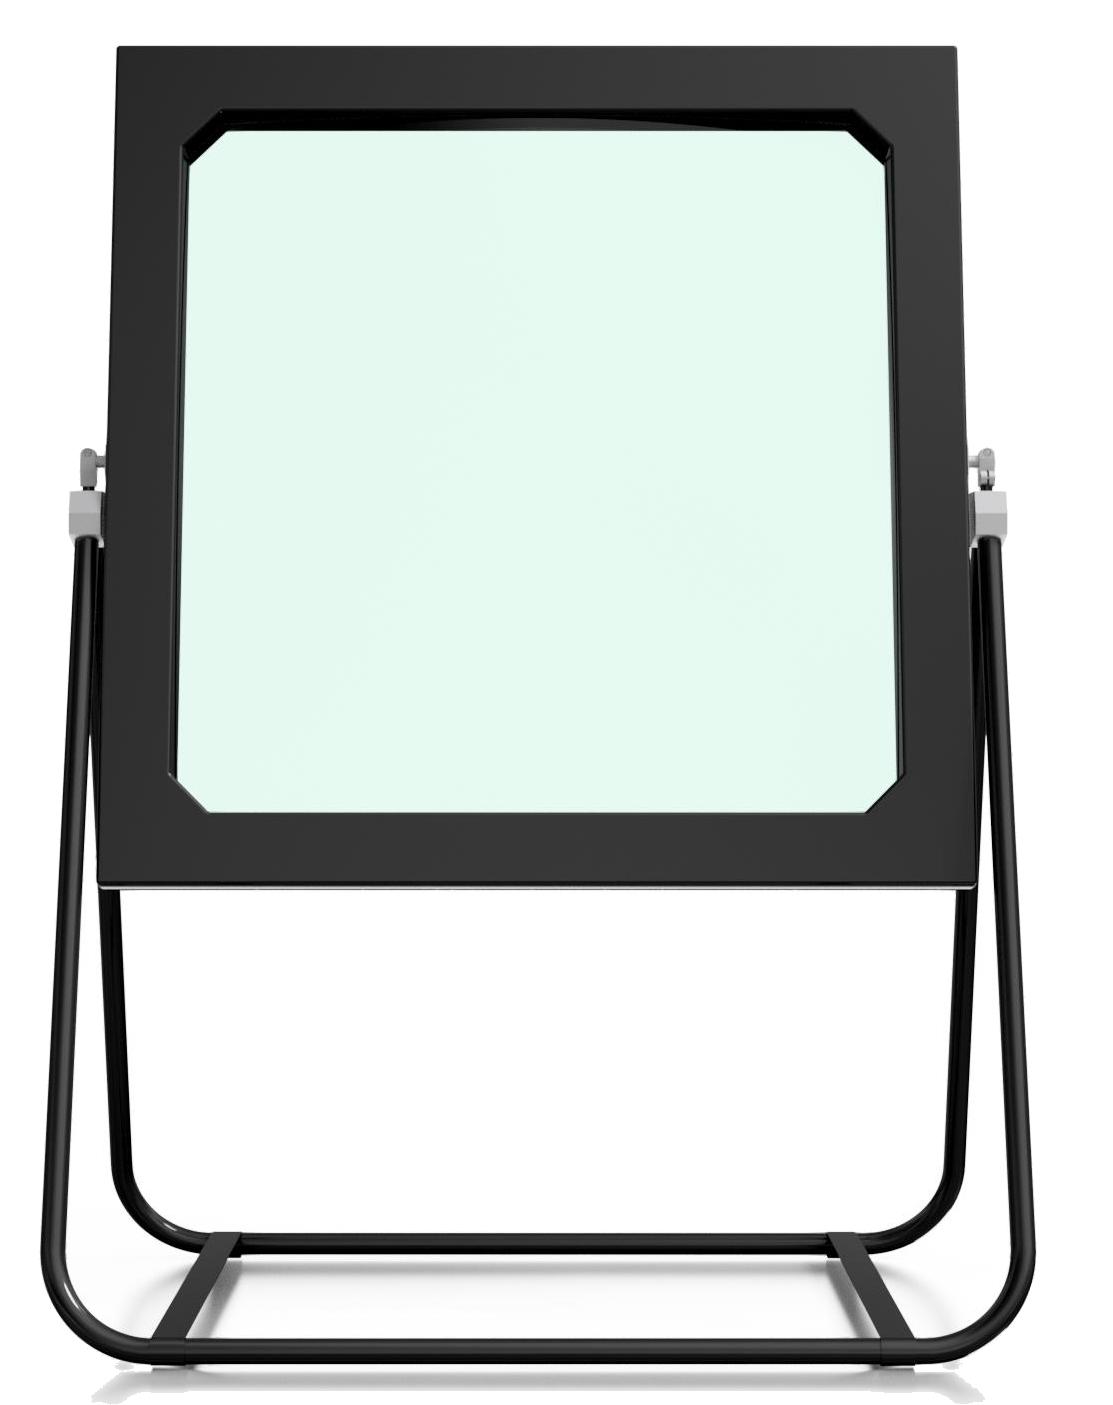 Deep Frame - Mixed Reality technology